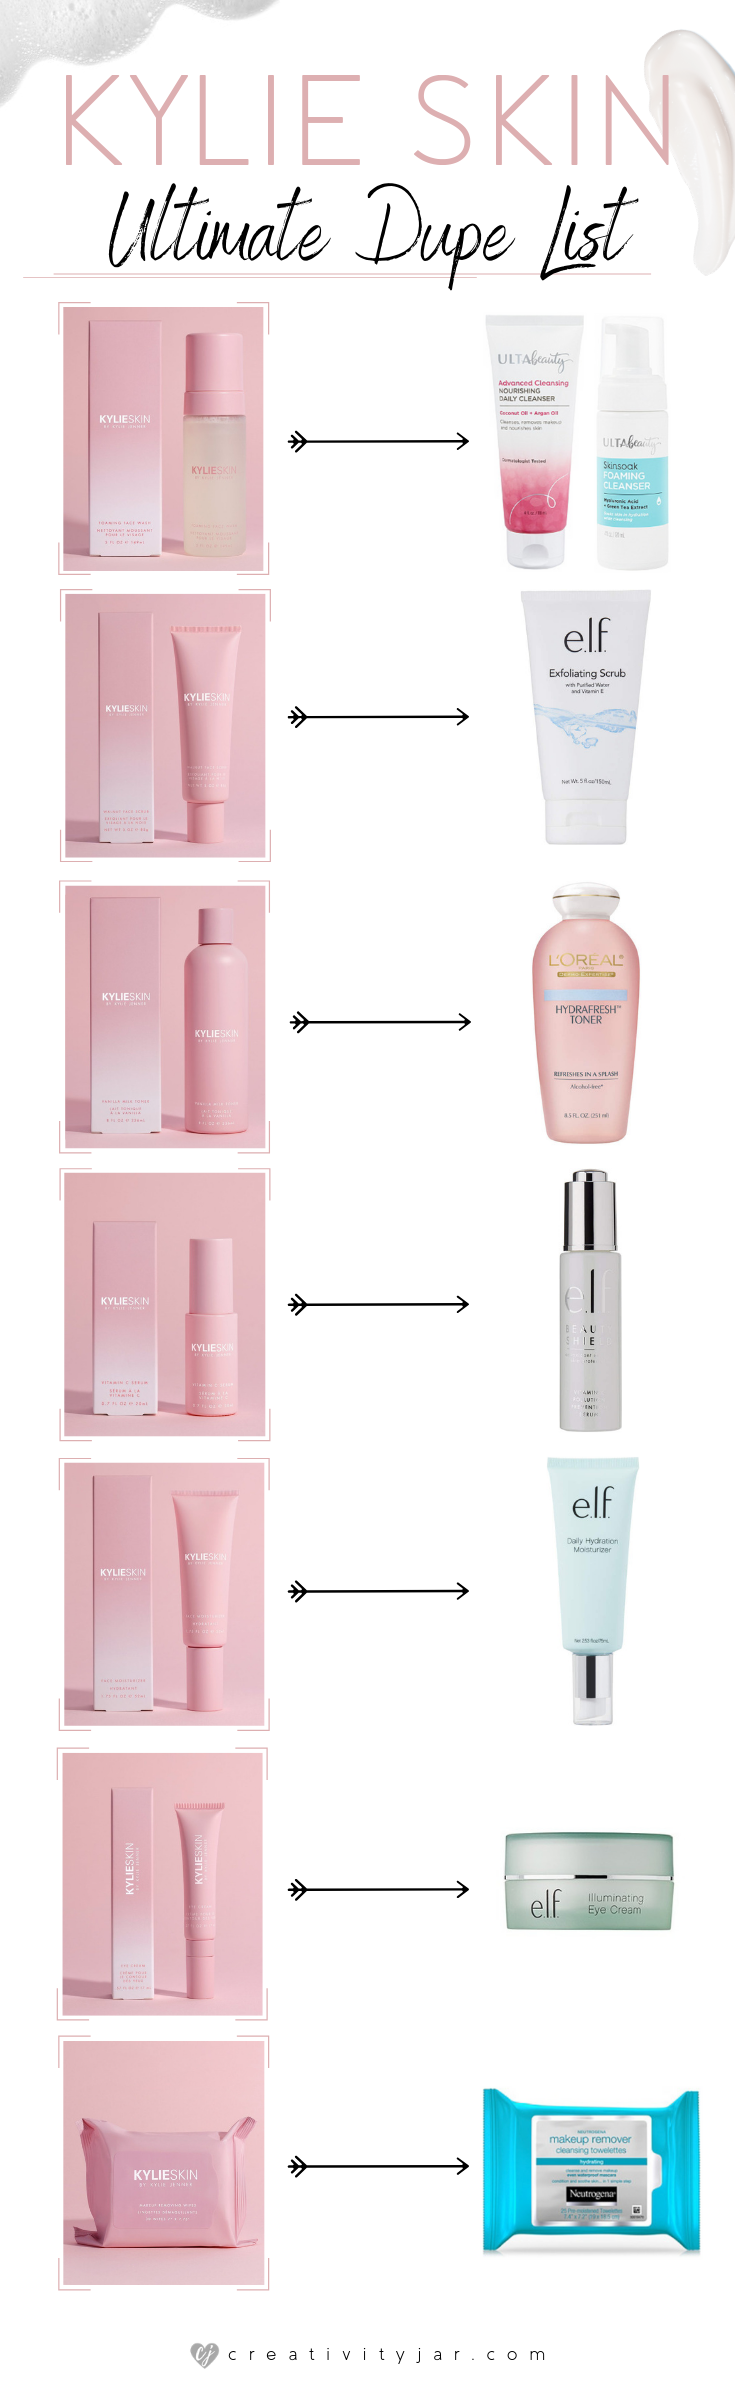 Kylie Skin Dupes Skin Care Skin Care Routine Steps Body Skin Care